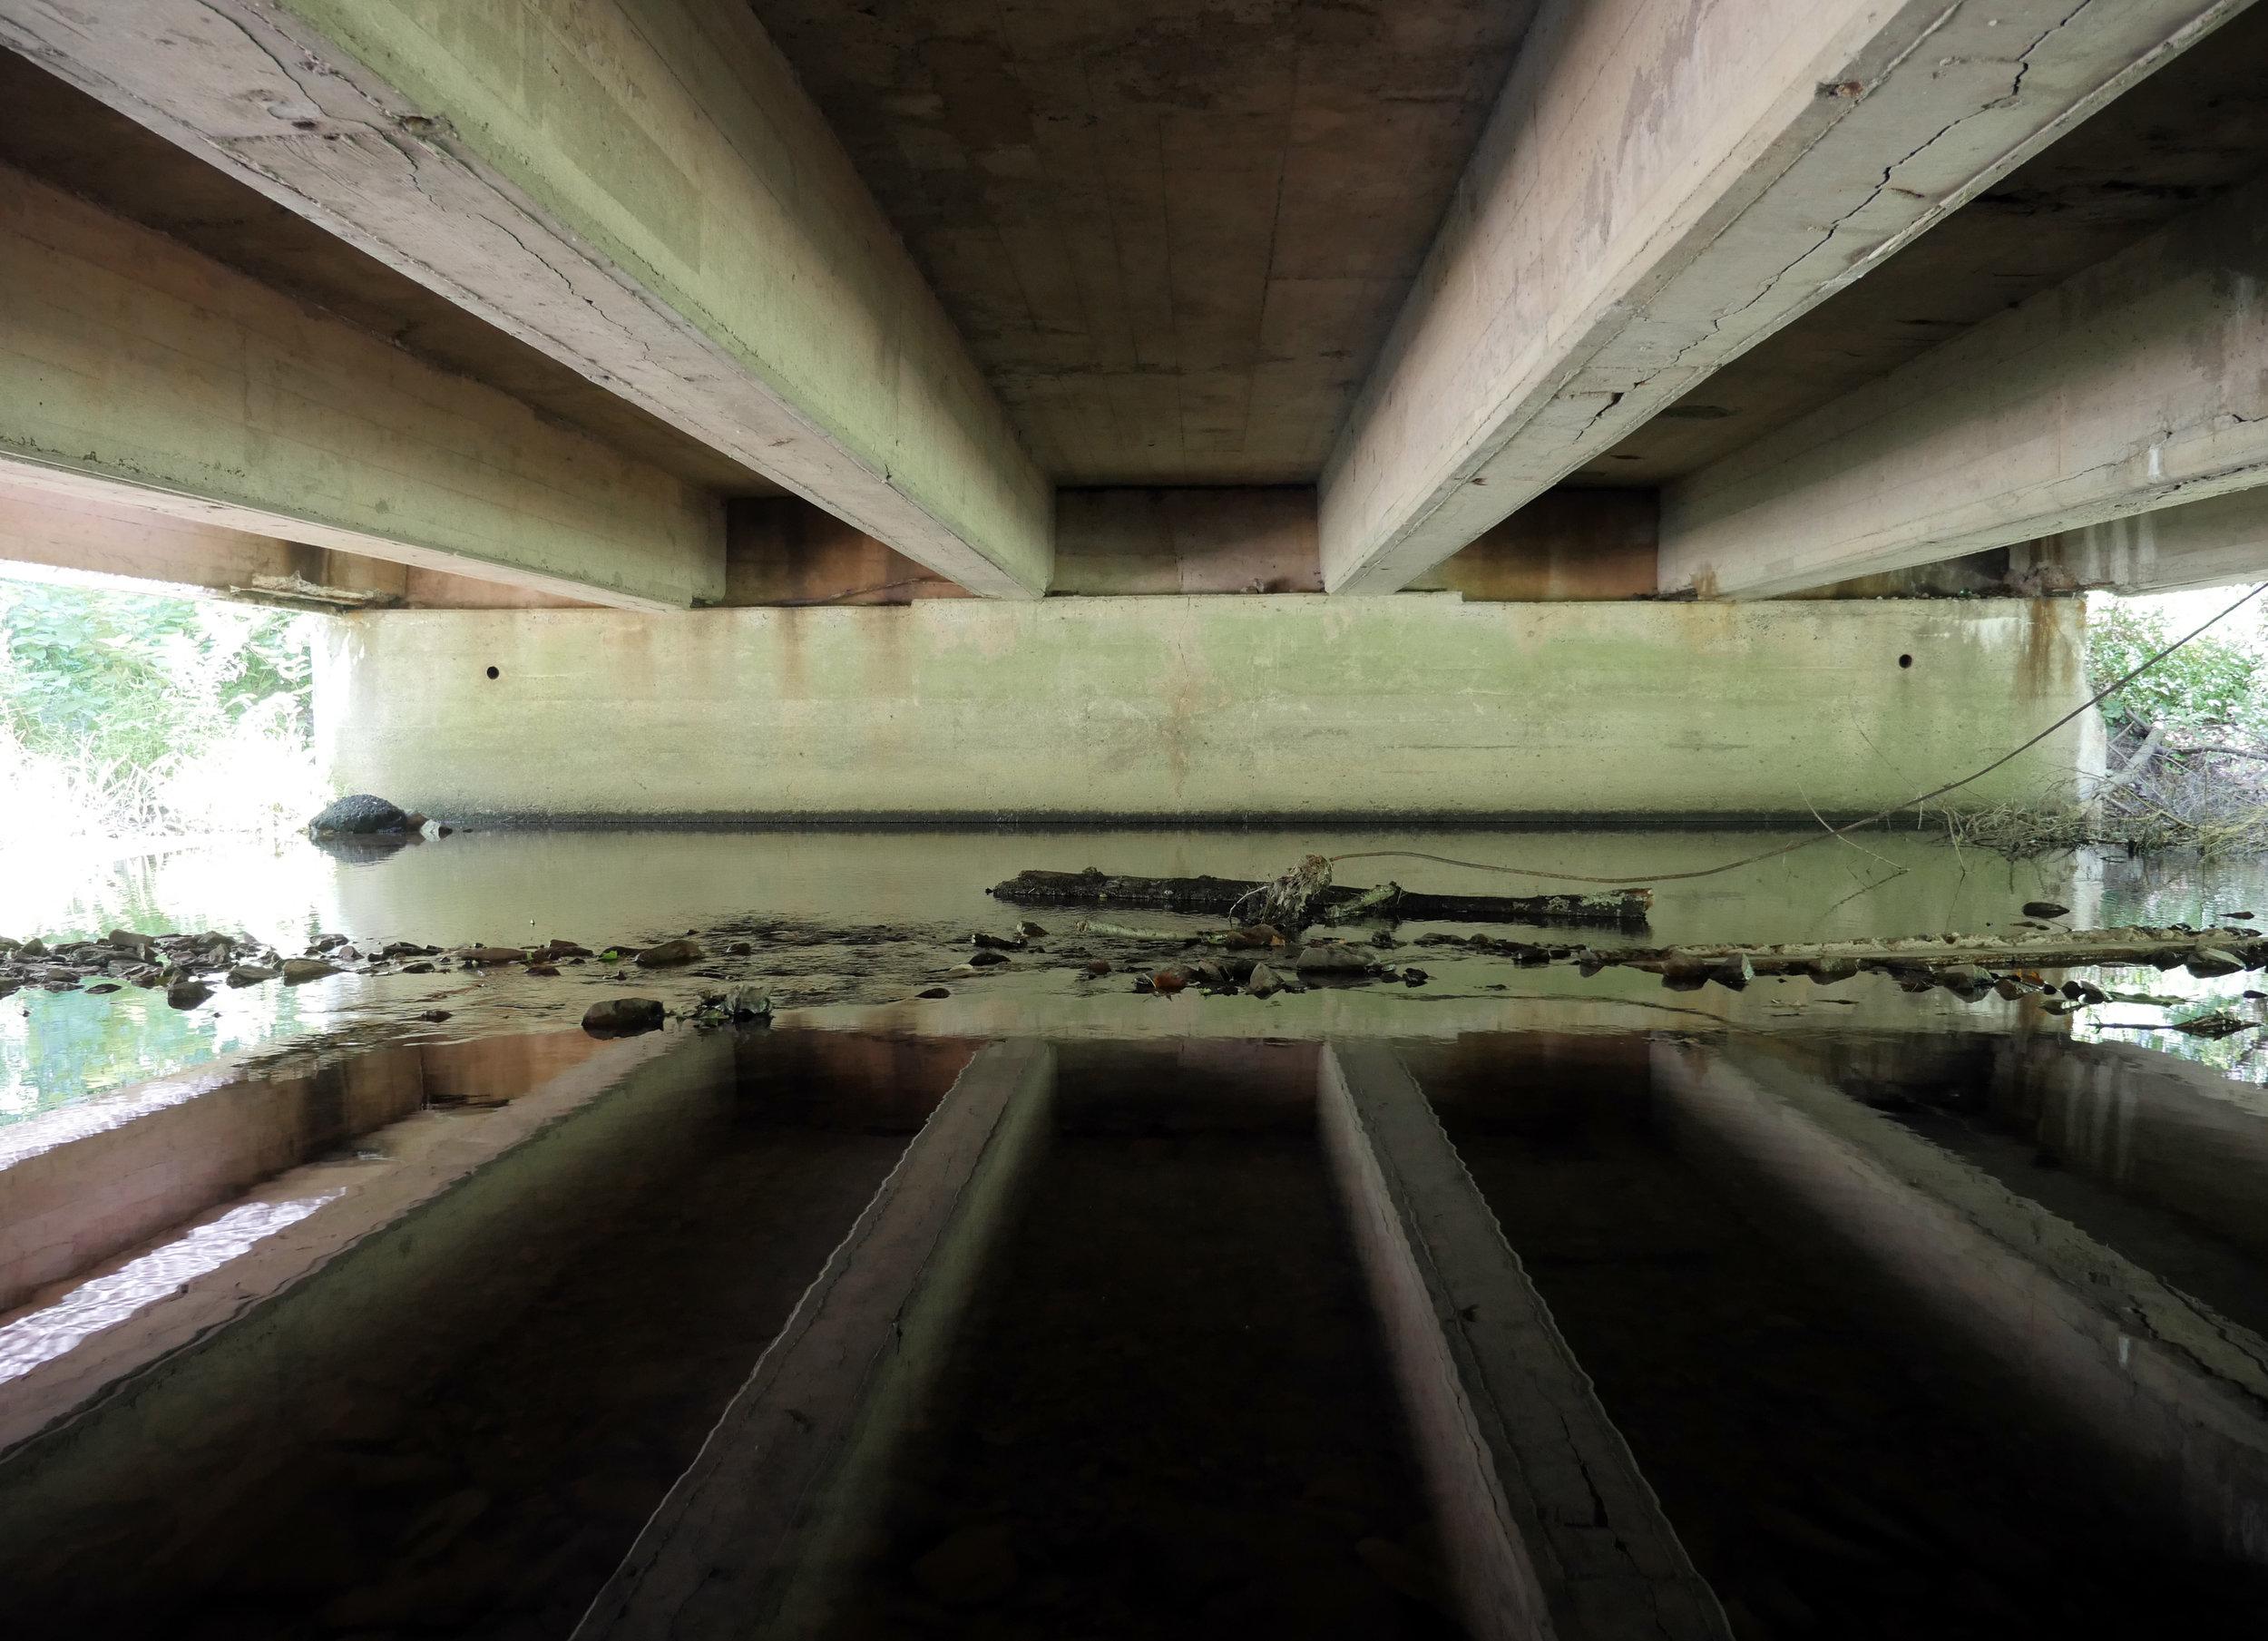 The underside of a bridge in Hopewell, New Jersey.